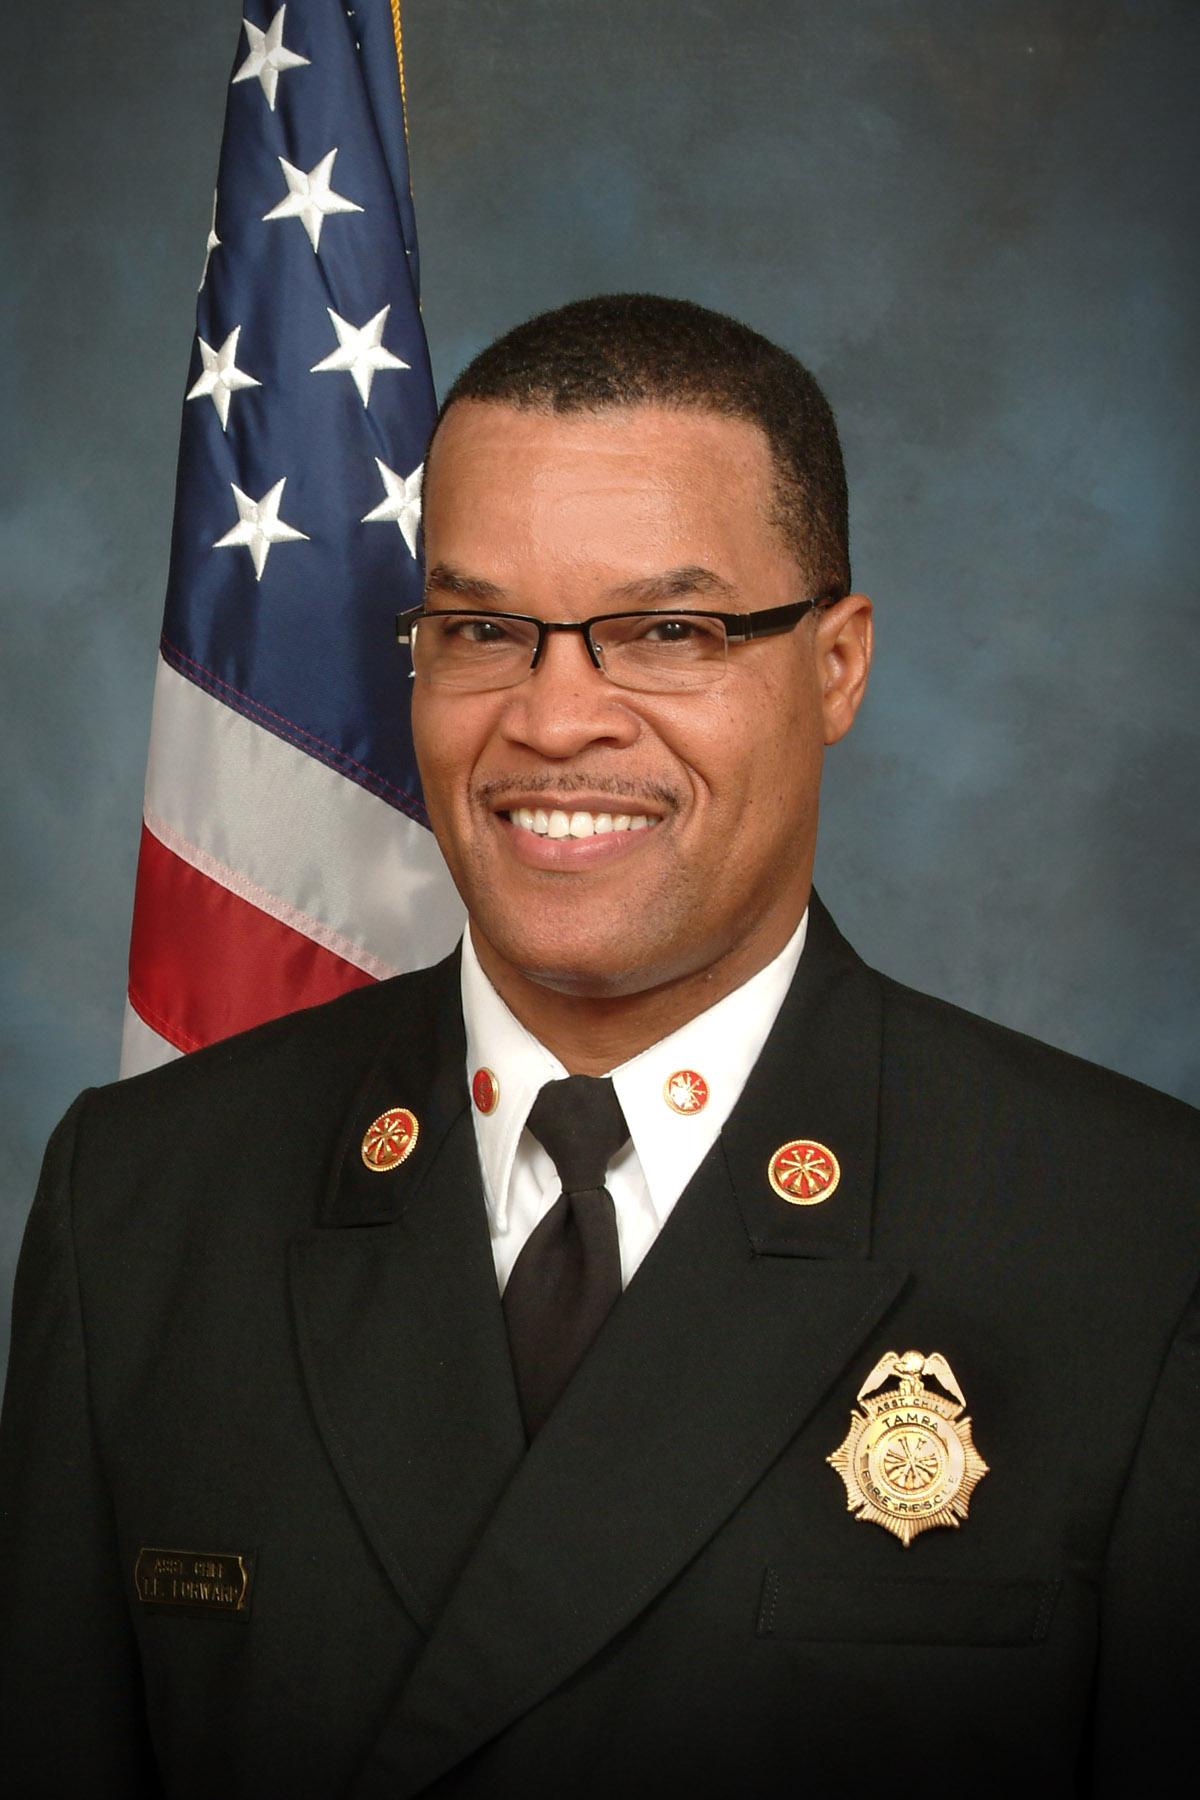 Fire Chief Talks About 'Worst Case Scenario' Of Nuclear Warfare